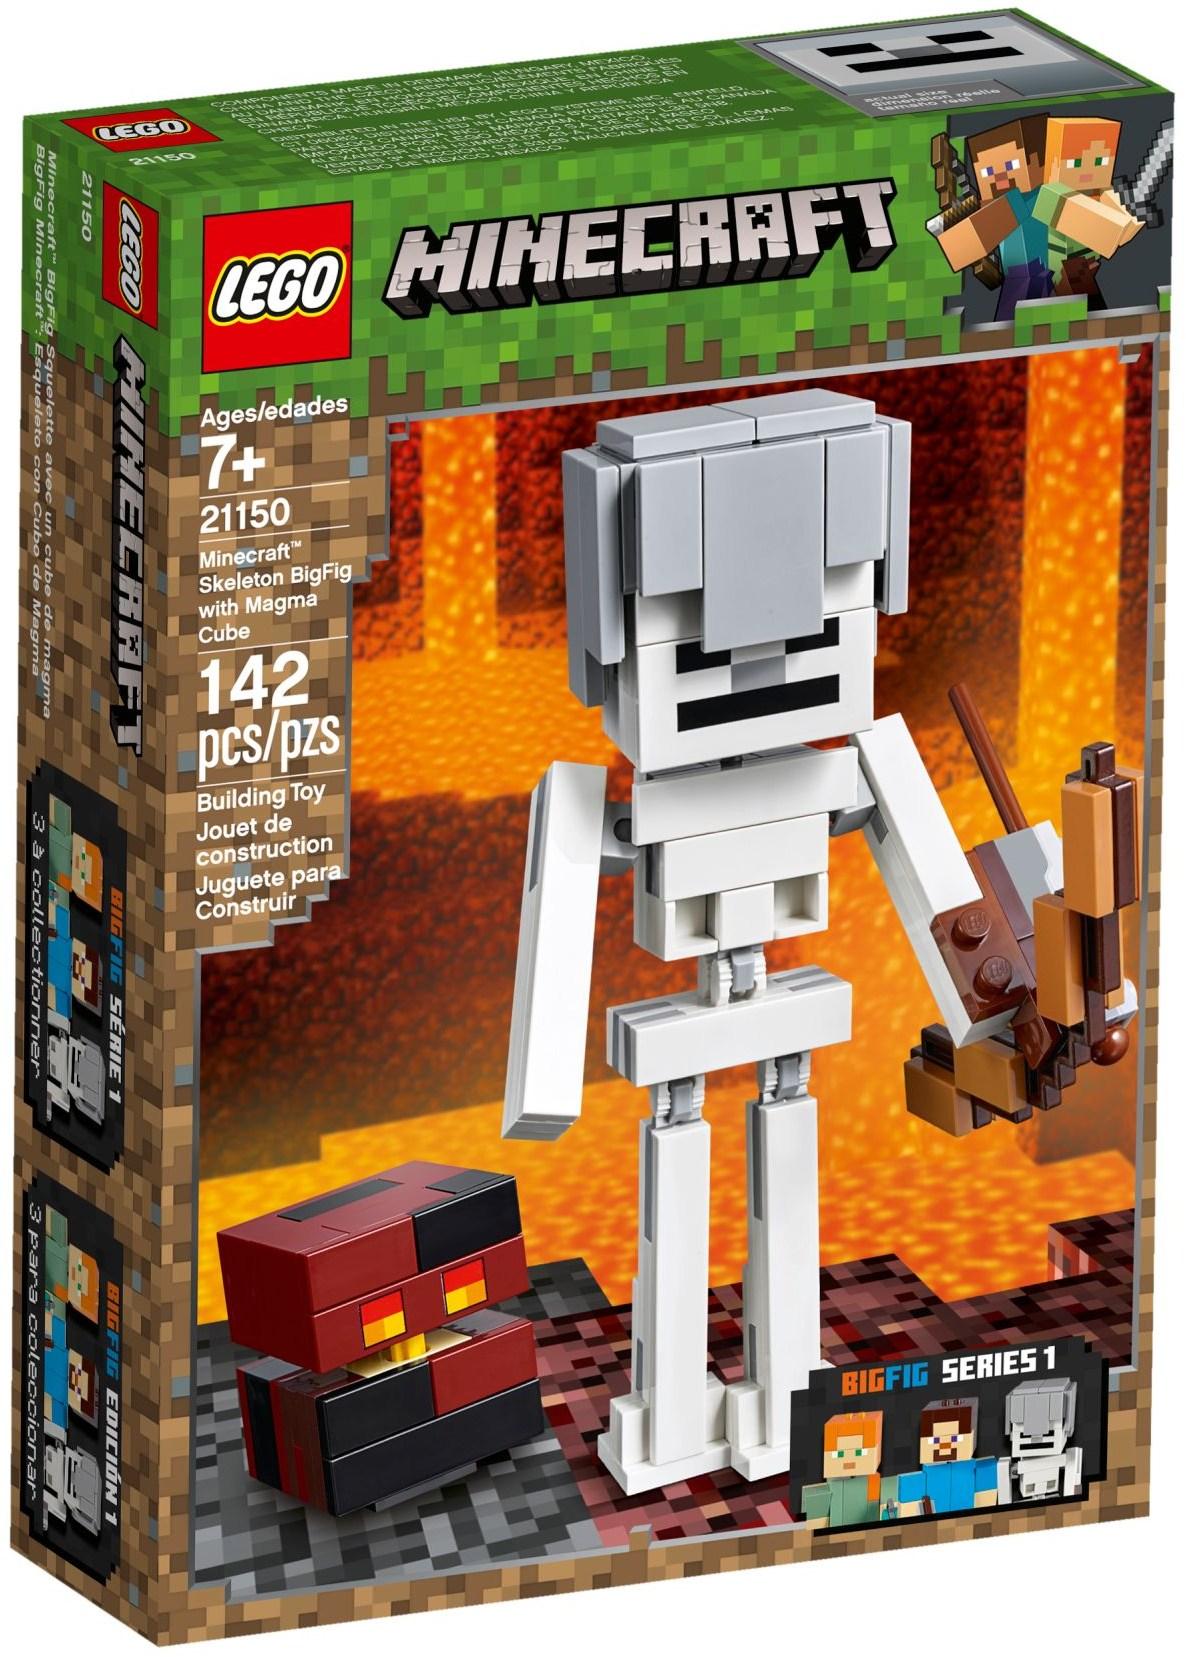 LEGO MINECRAFT SKELETON BIGFIG -21150